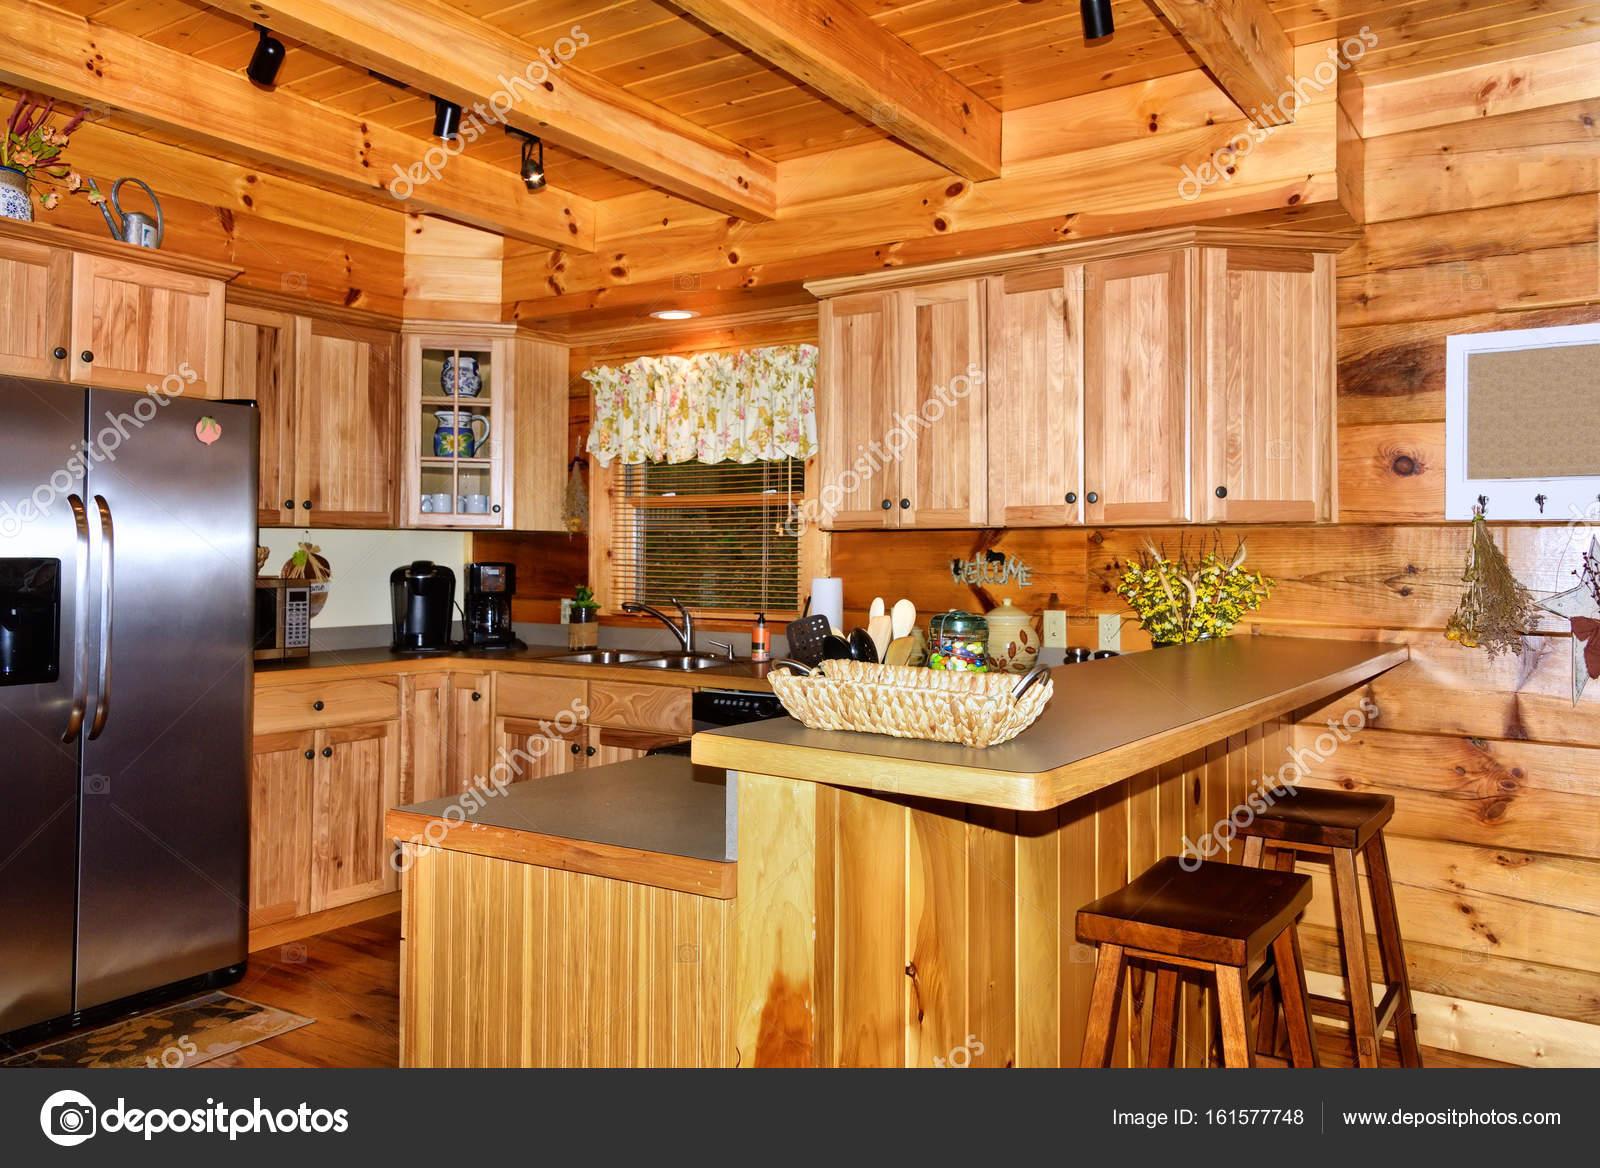 Küche in Kabine — Stockfoto © TallyPic #161577748